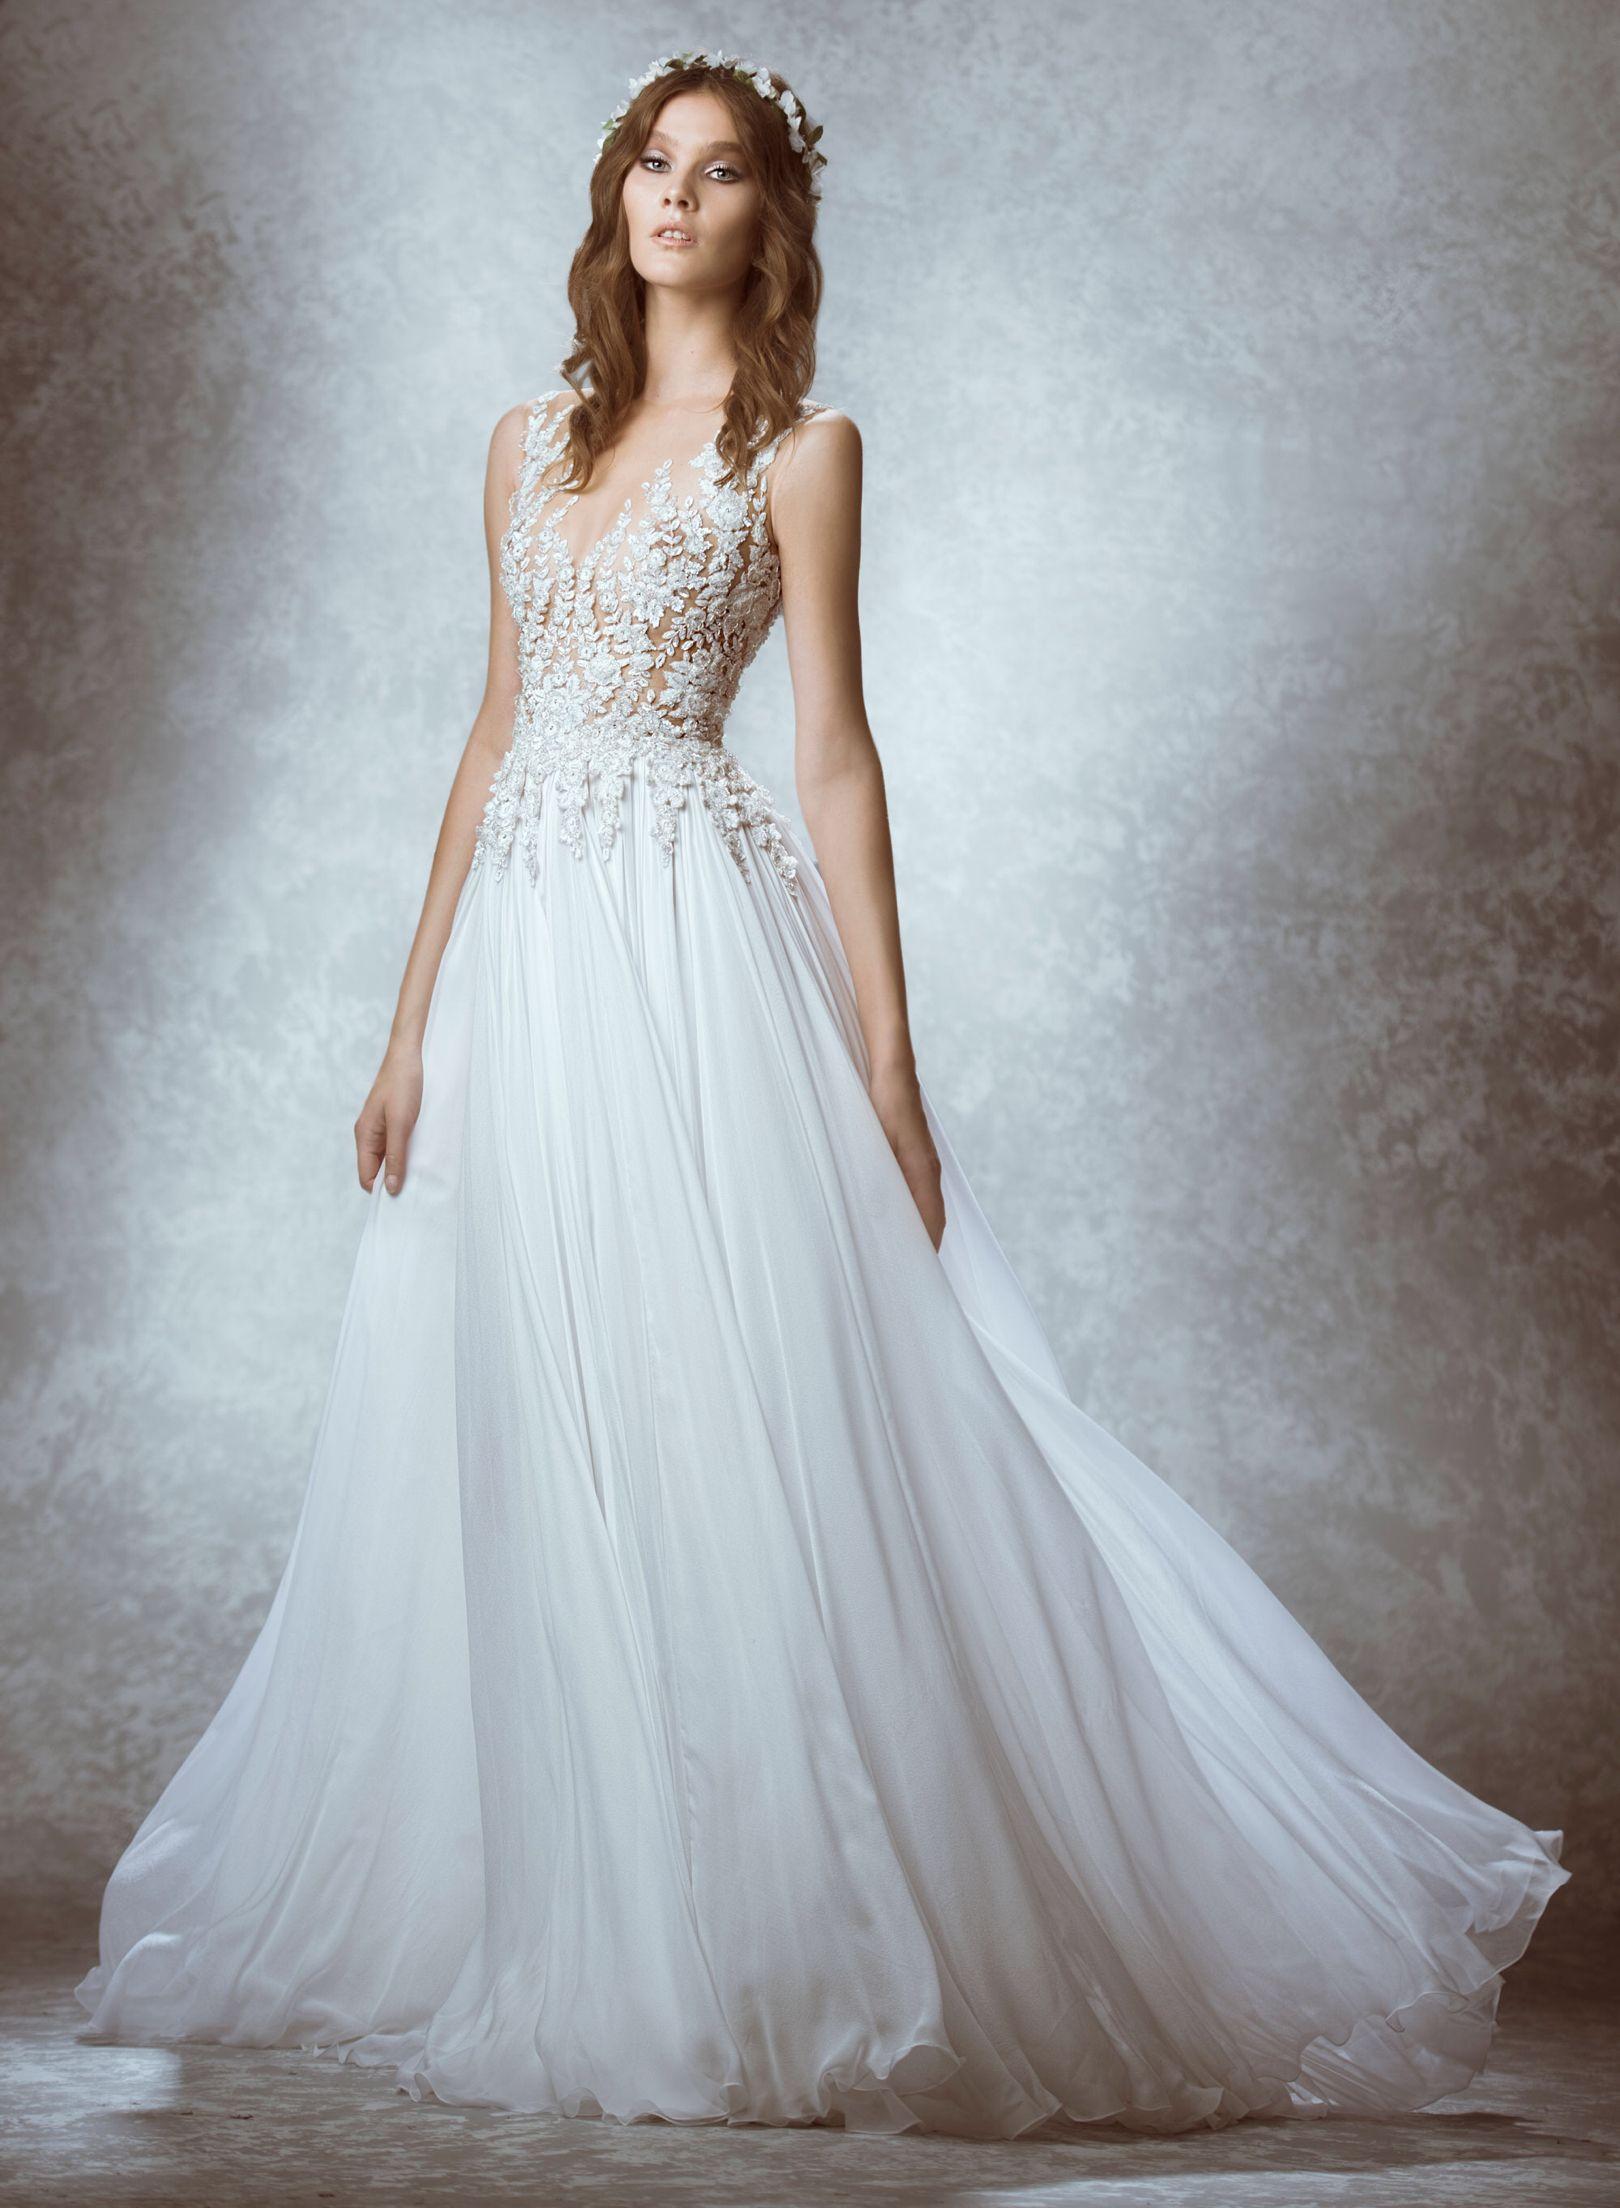 Bröllops kläning | dresses | Pinterest | Wedding dress, Wedding and ...